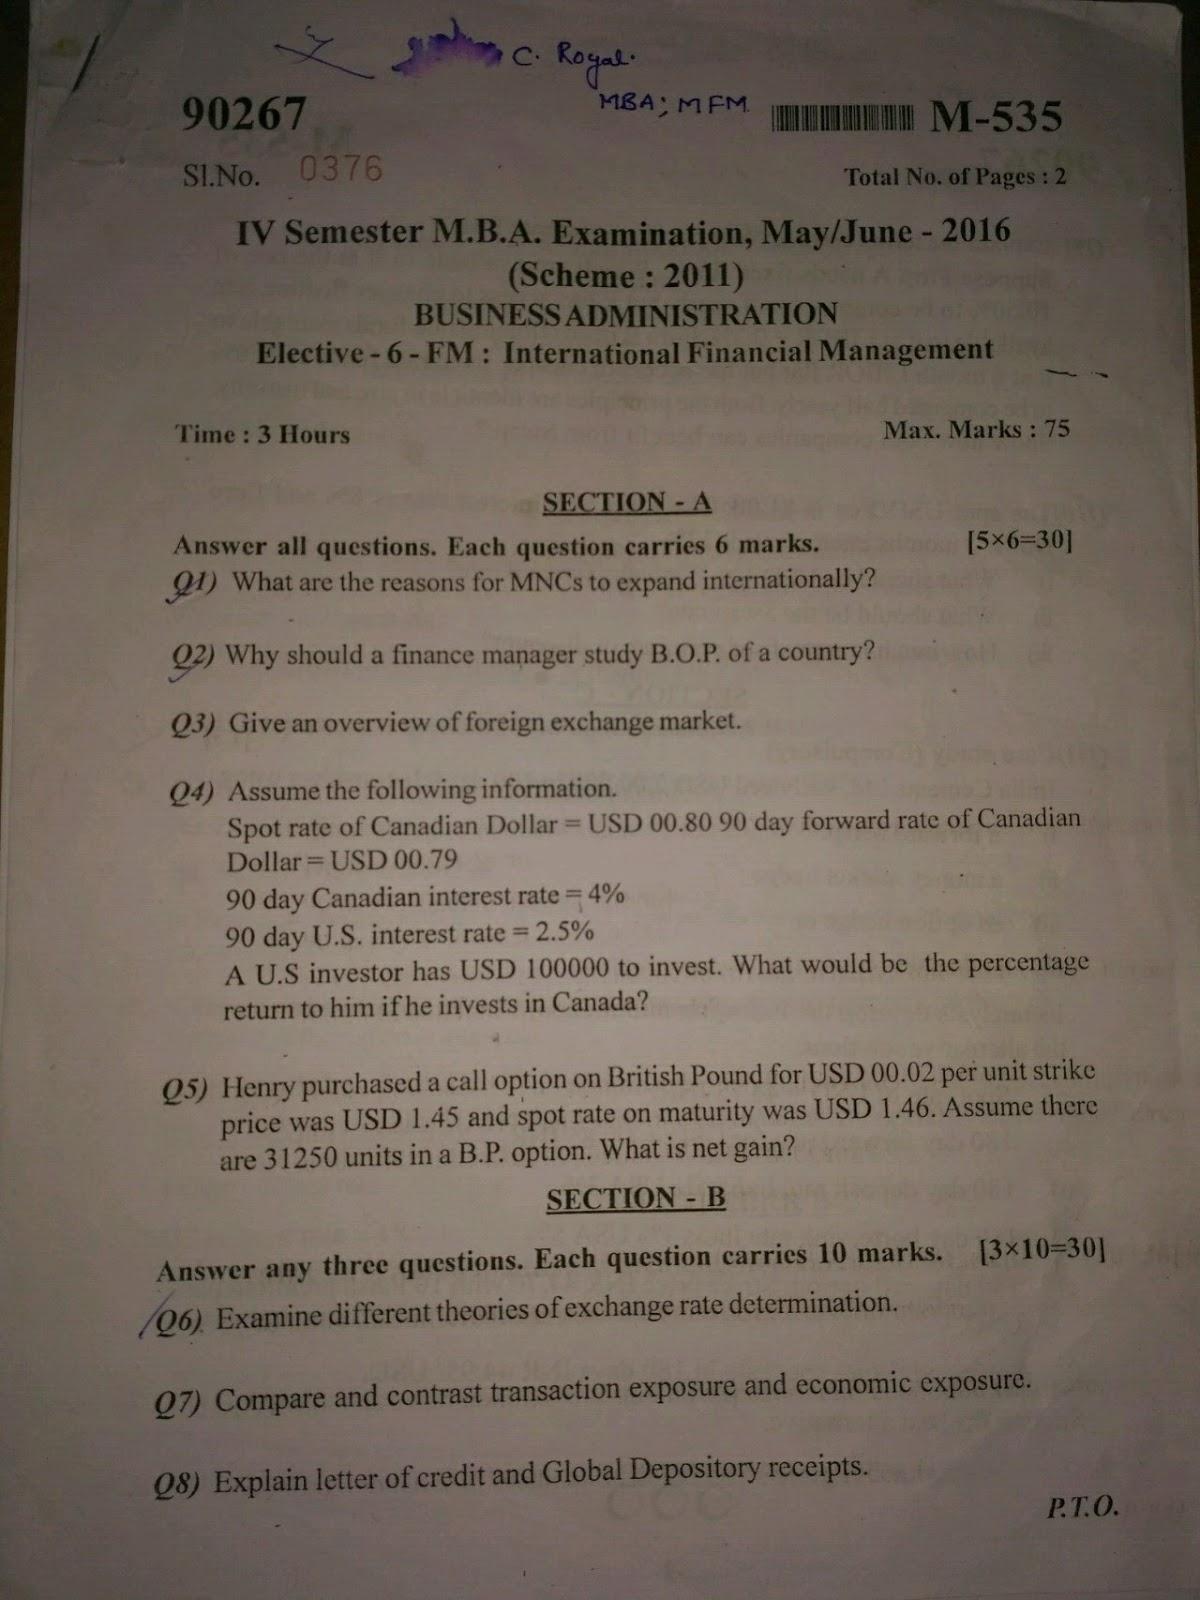 IV SEM INTERNATIONAL FINANCIAL MANAGEMENT QUESTION PAPERS